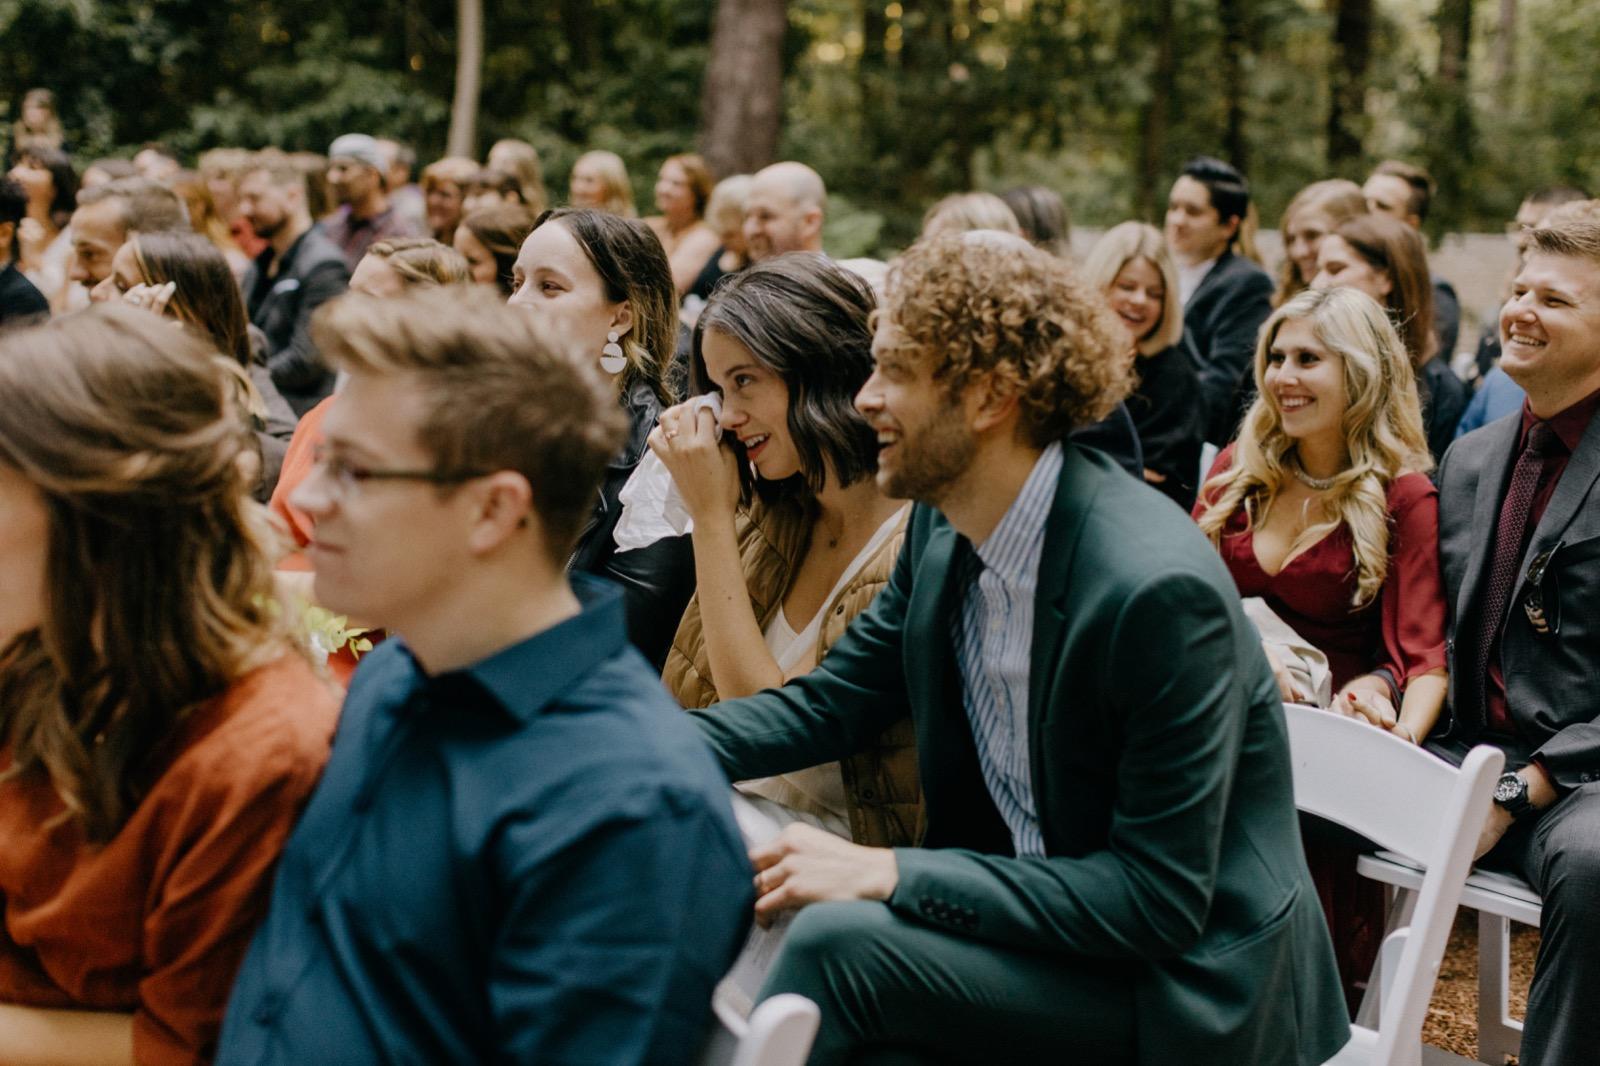 077_Emily & Jeff Wedding 0717_the-waterfall-lodge_forest_wedding_ben-lomond_intimate